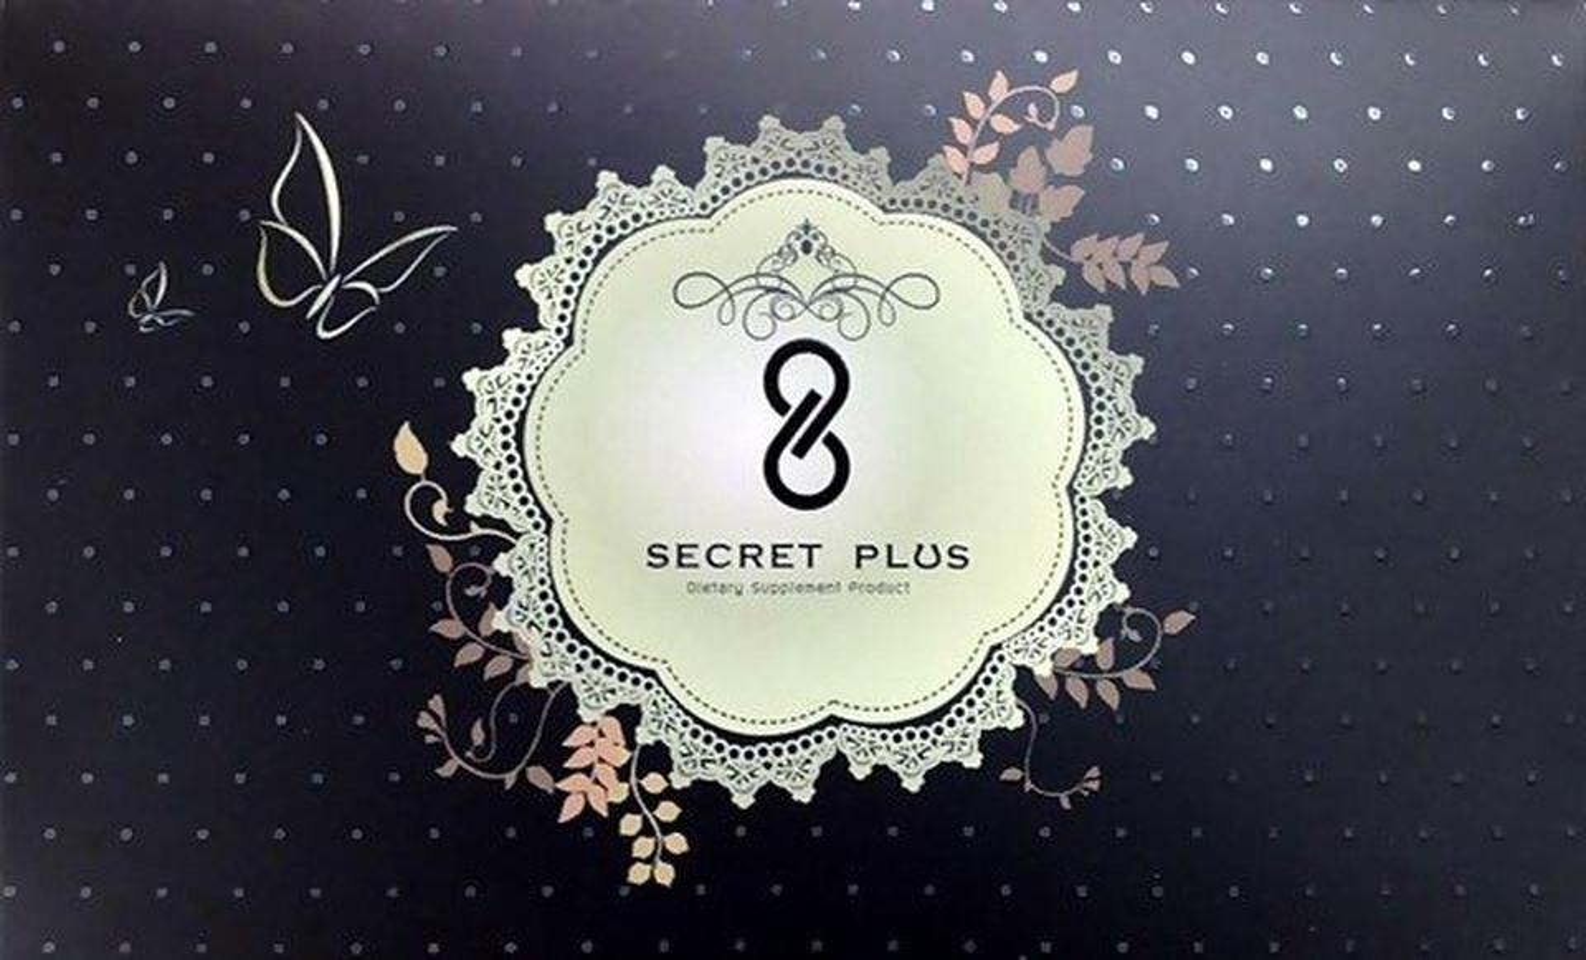 Secret Plus ซีเครทพลัส เพิ่มขนาดทรวงอก ให้อิ๋มอวบอิ่ม เพิ่มน้ำหล่อลื่นและอารมณ์เพศ รูปที่ 1